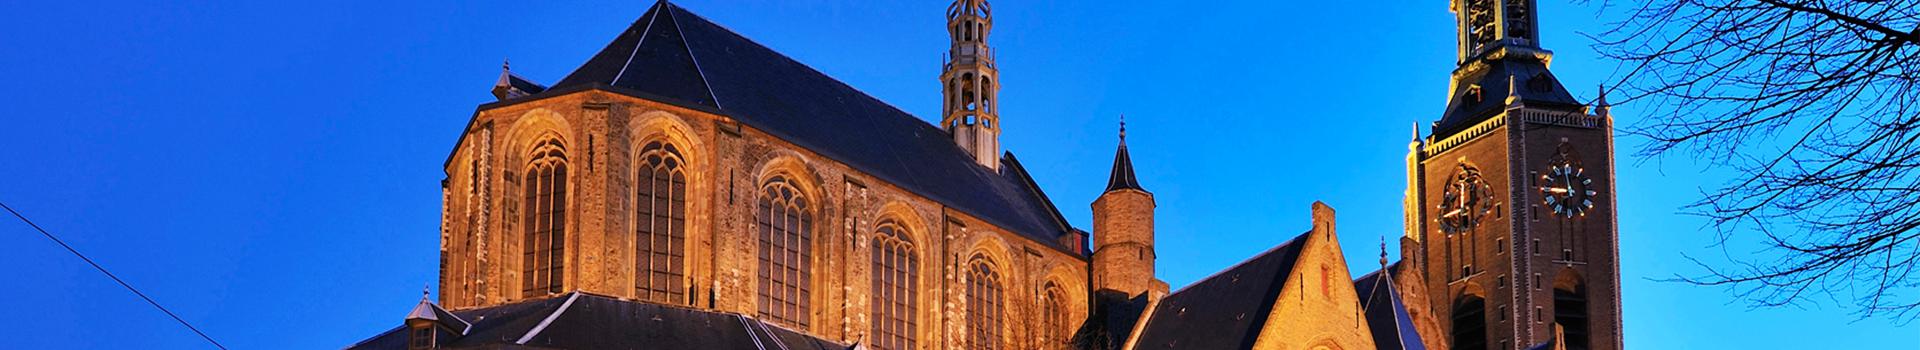 Stichting Orgelconcerten Grote Kerk Den Haag